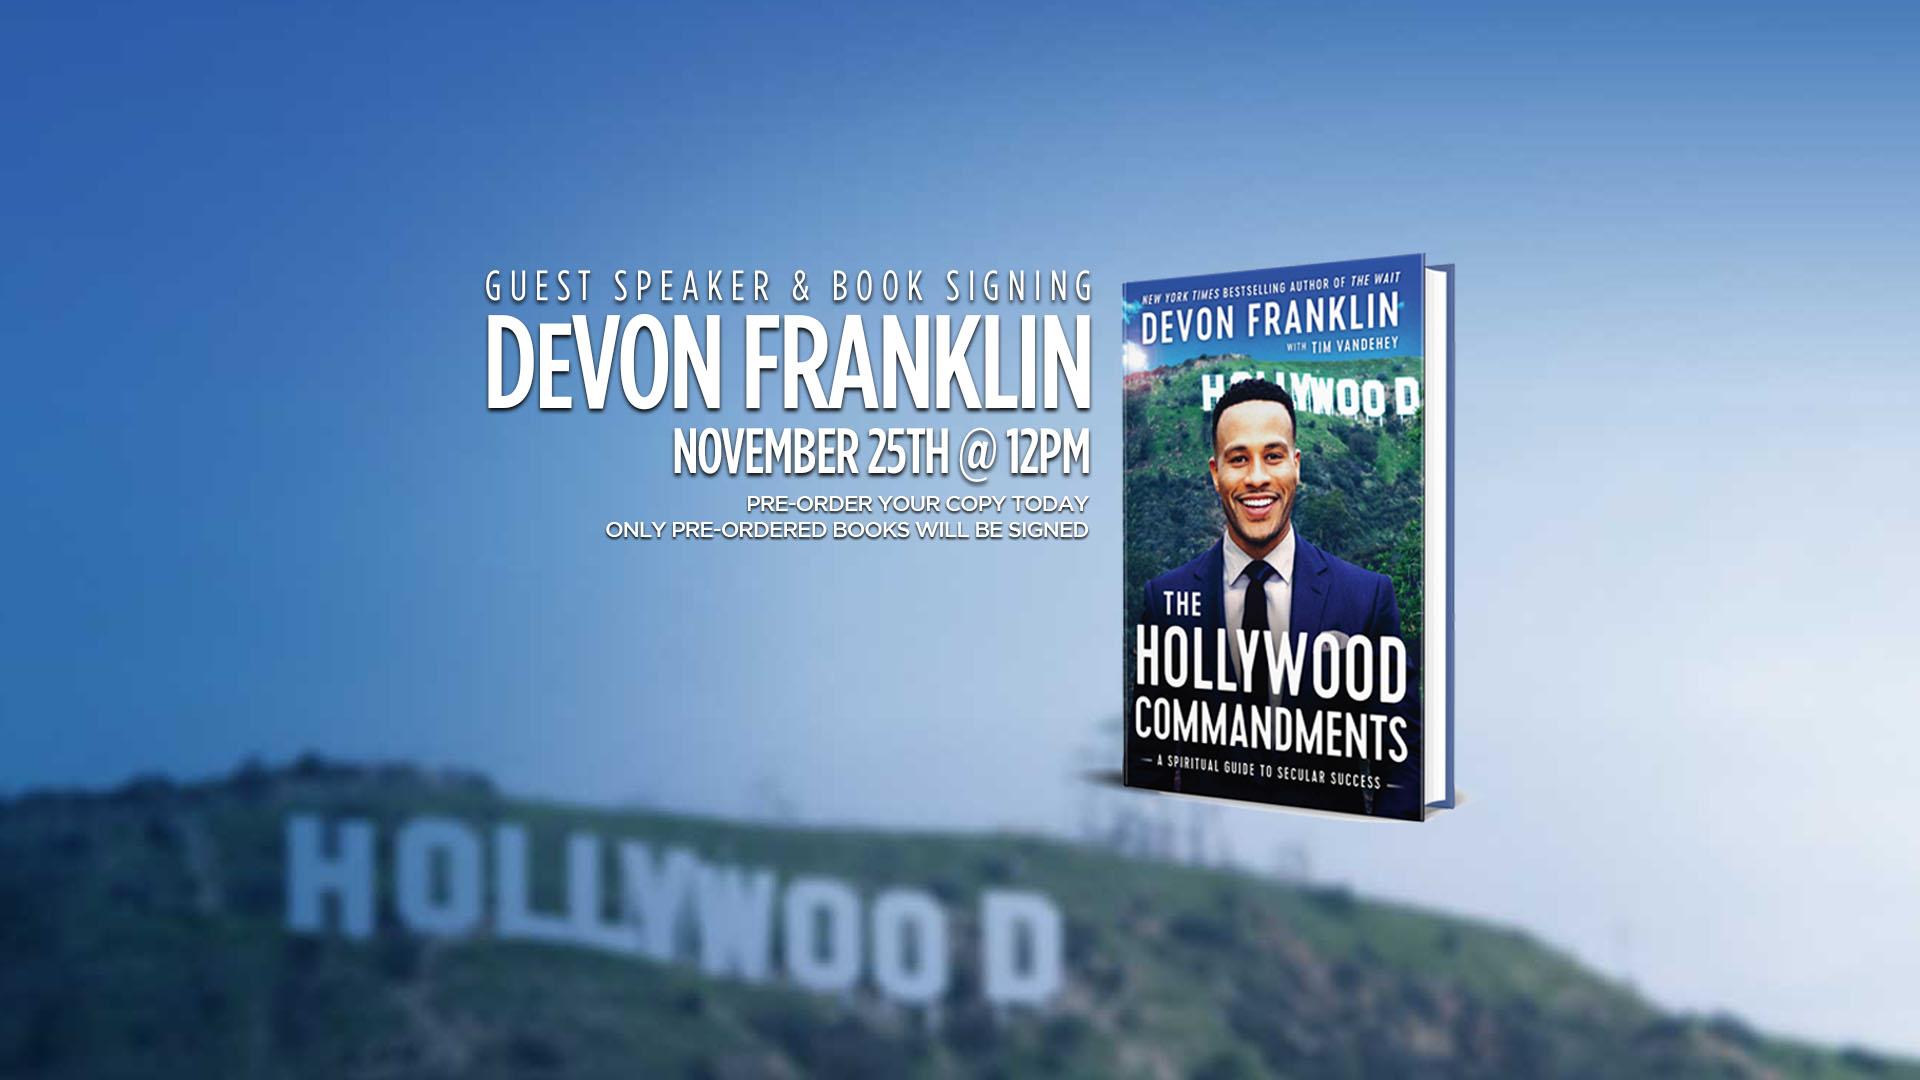 EVENT: Hollywood Commandments